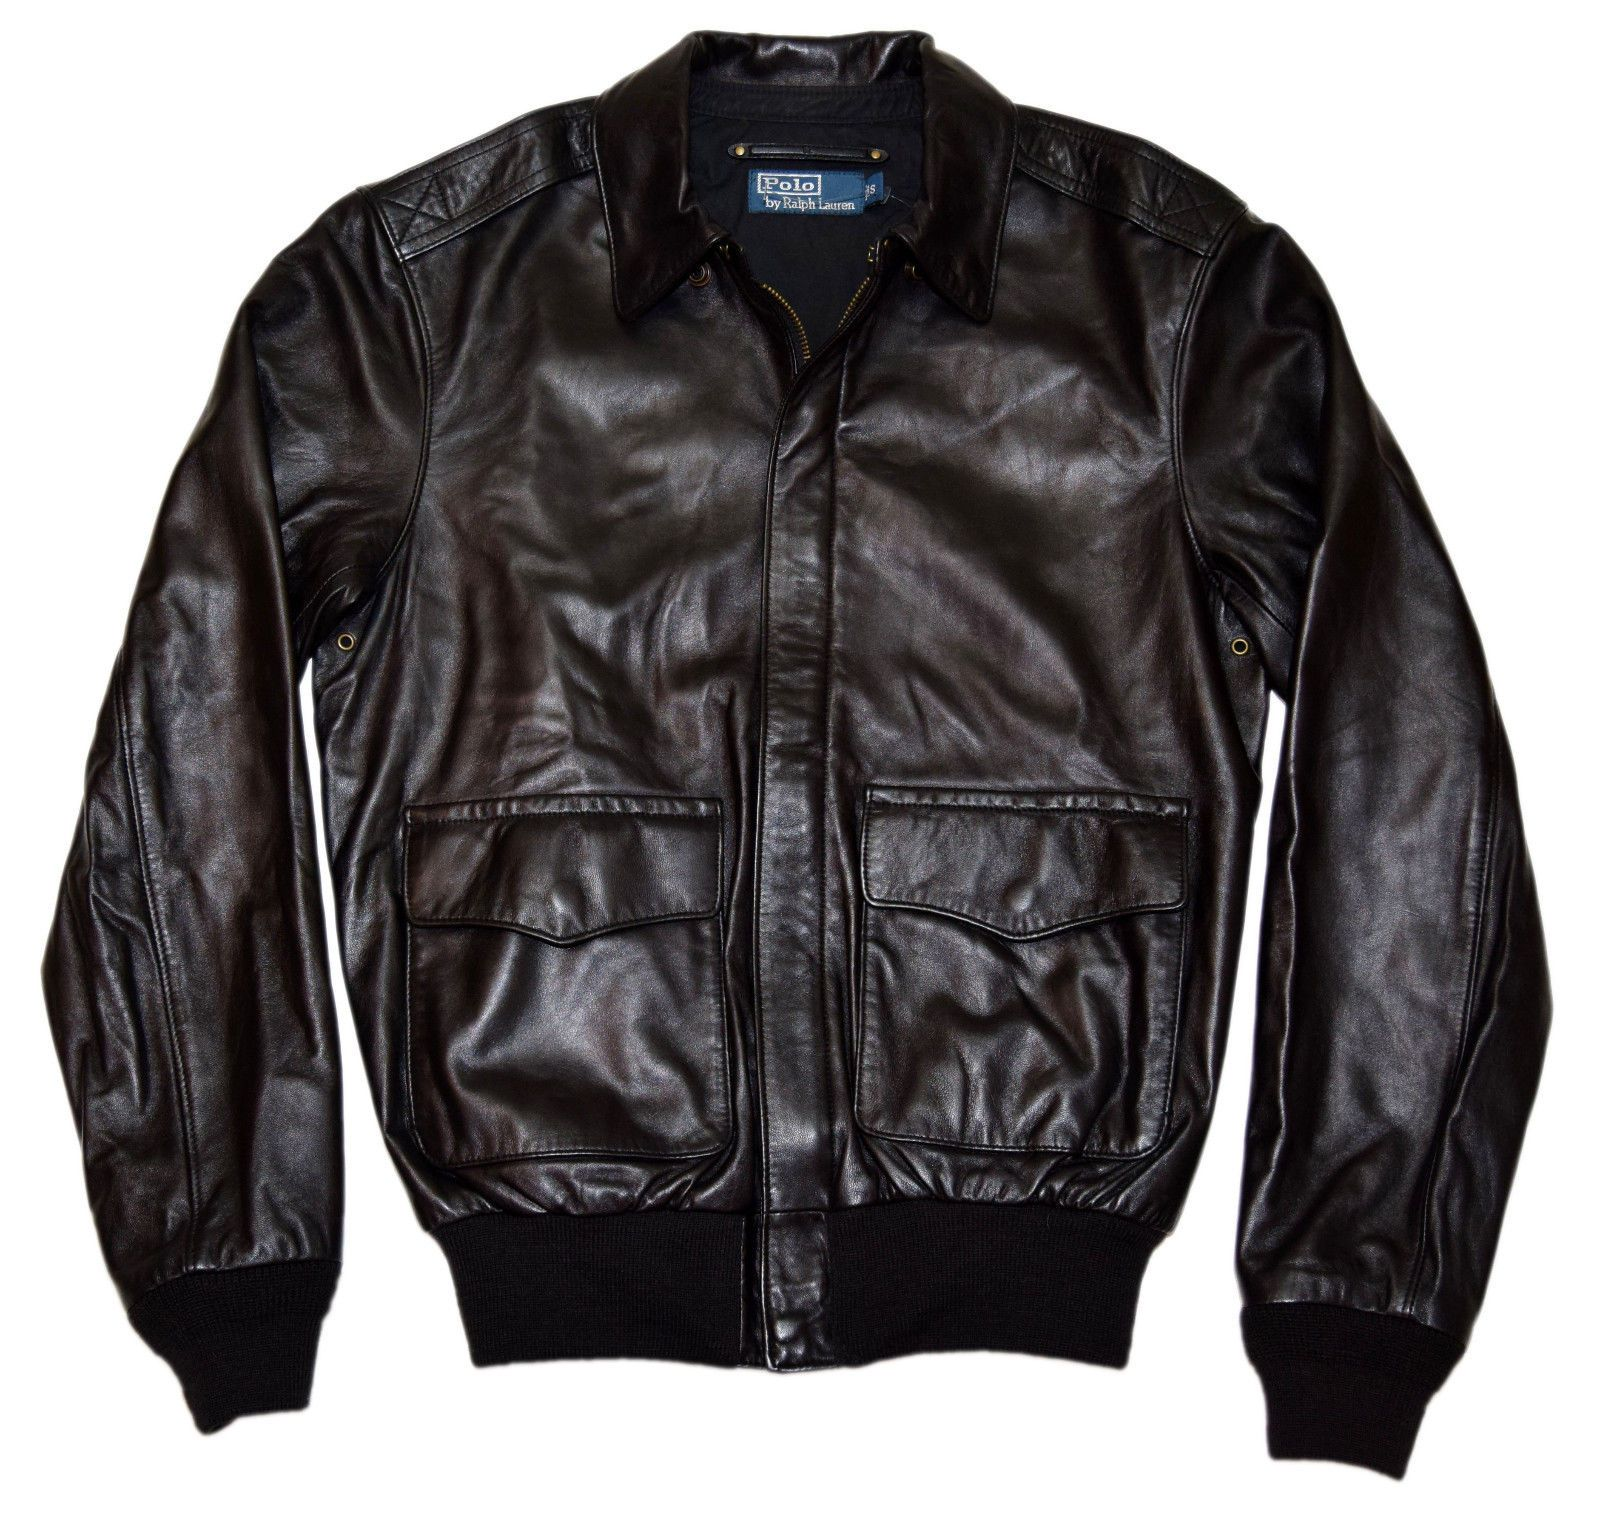 Polo Ralph Lauren Mens Vintage Bomber Epaulet Leather Jacket Coat Black Large Leather Bomber Jacket Vintage Men Polo Ralph Lauren Mens [ 1517 x 1600 Pixel ]